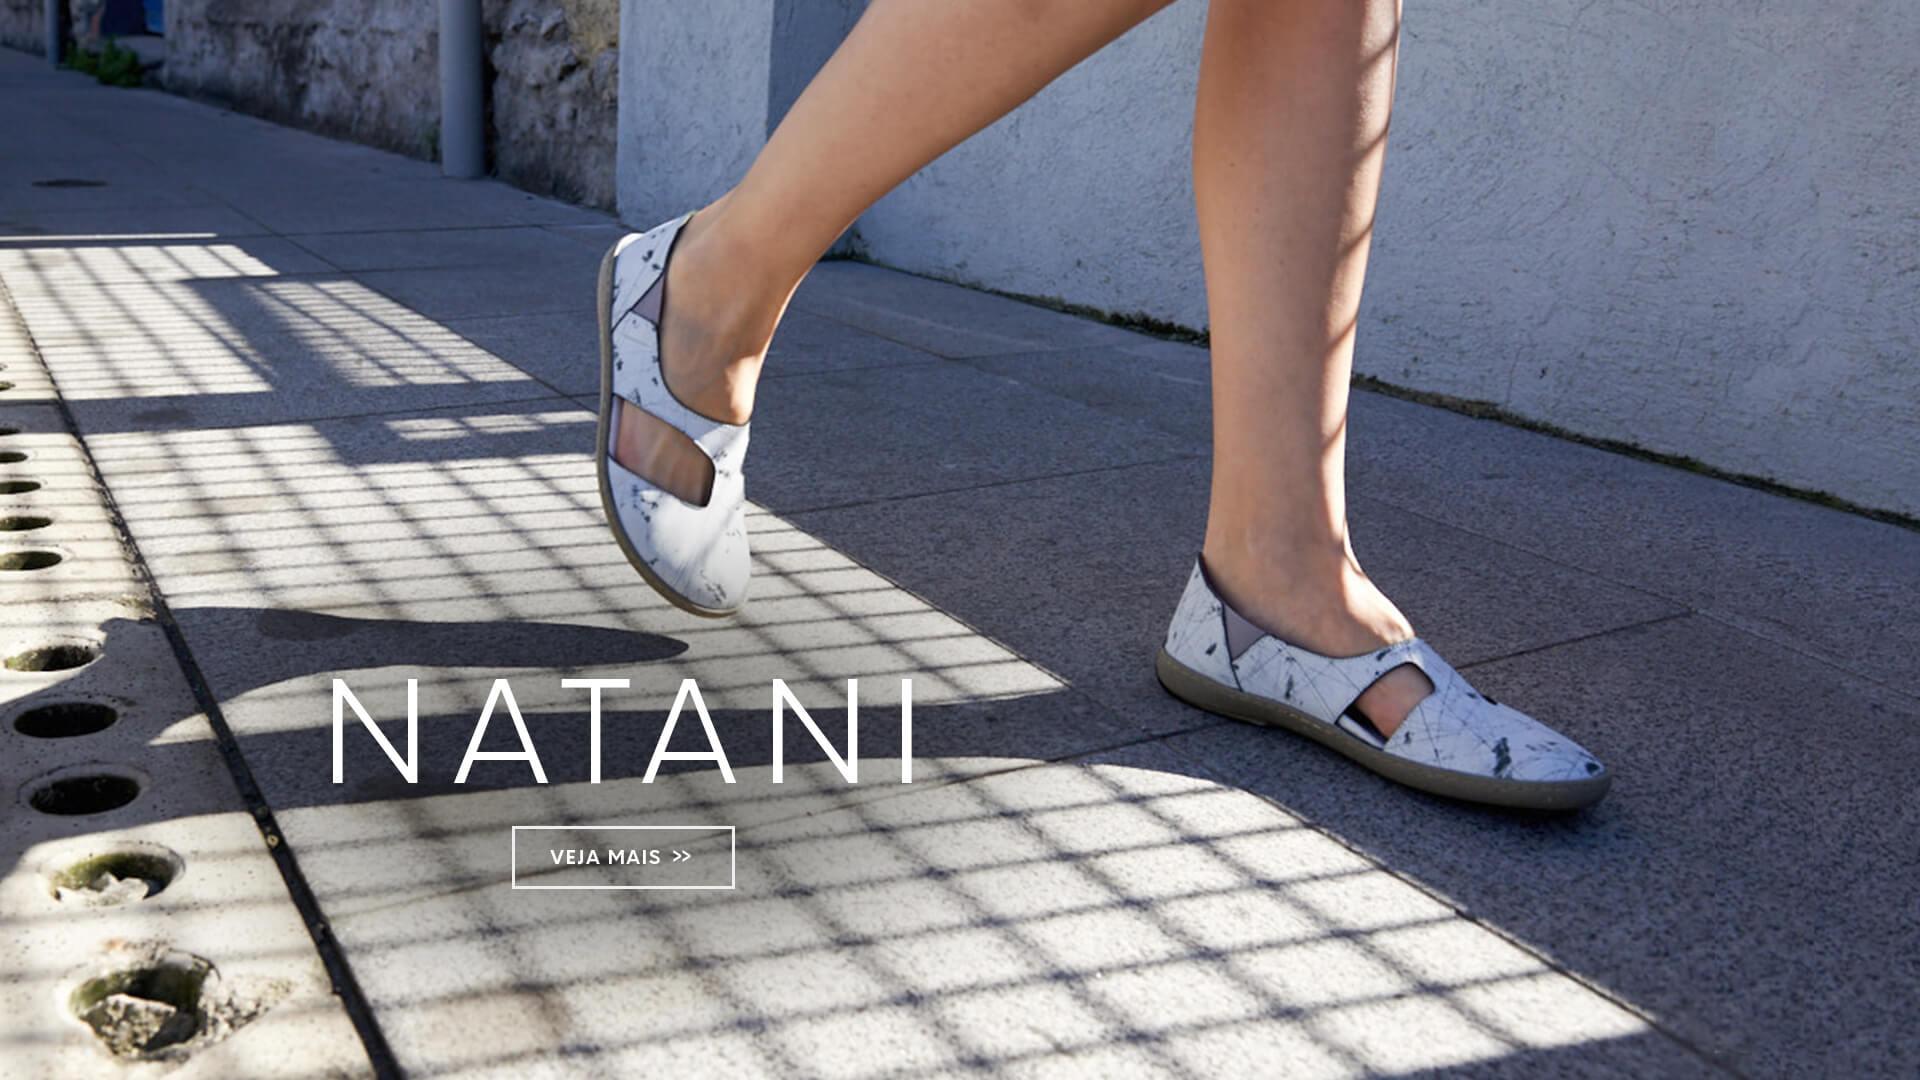 Natani